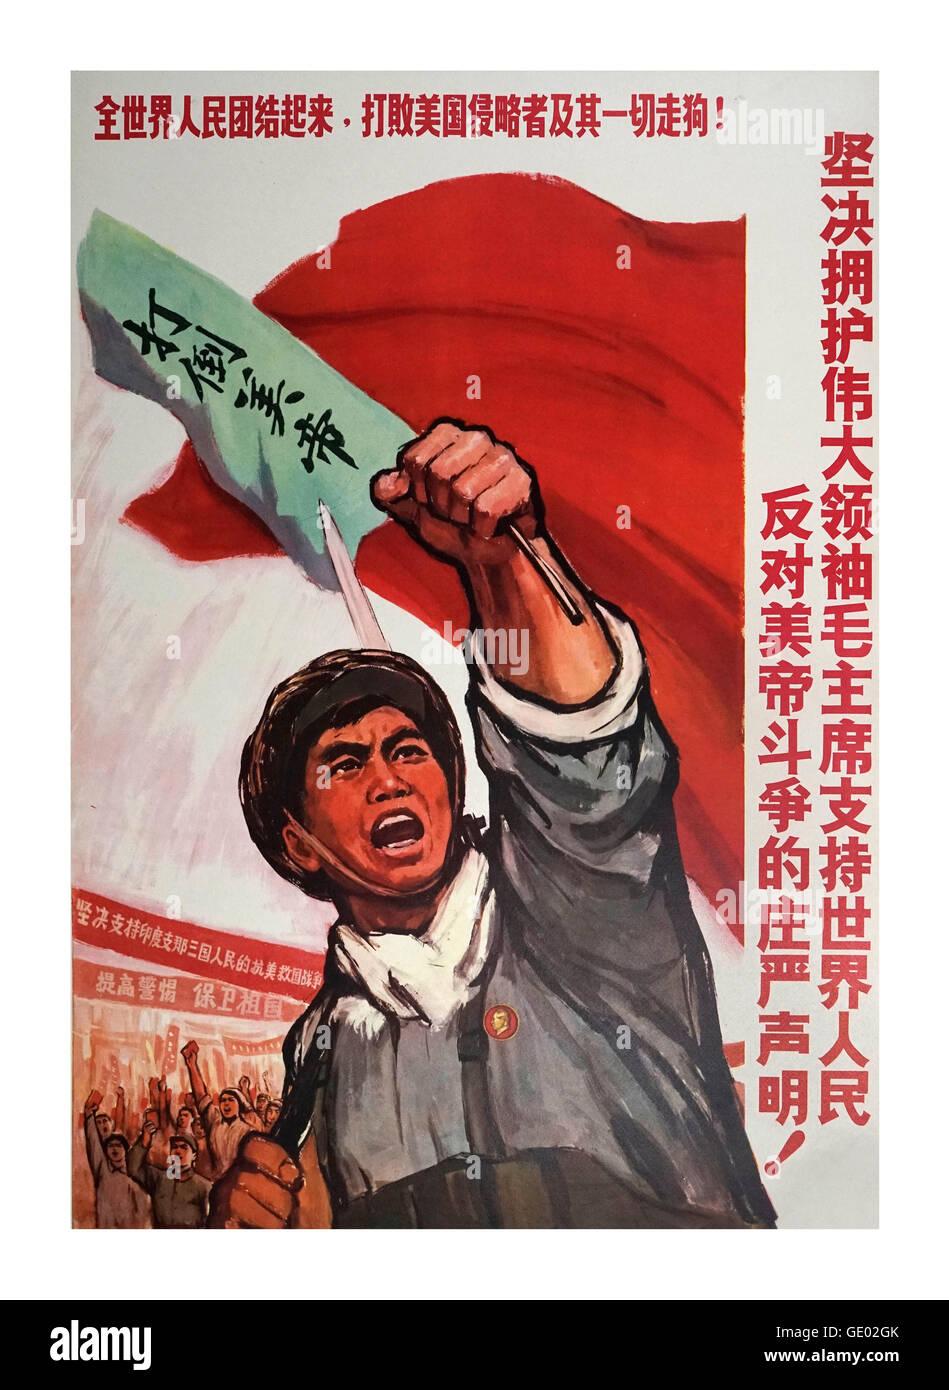 1960's China Propaganda Posters Illustrate Chinese Communism - Stock Image